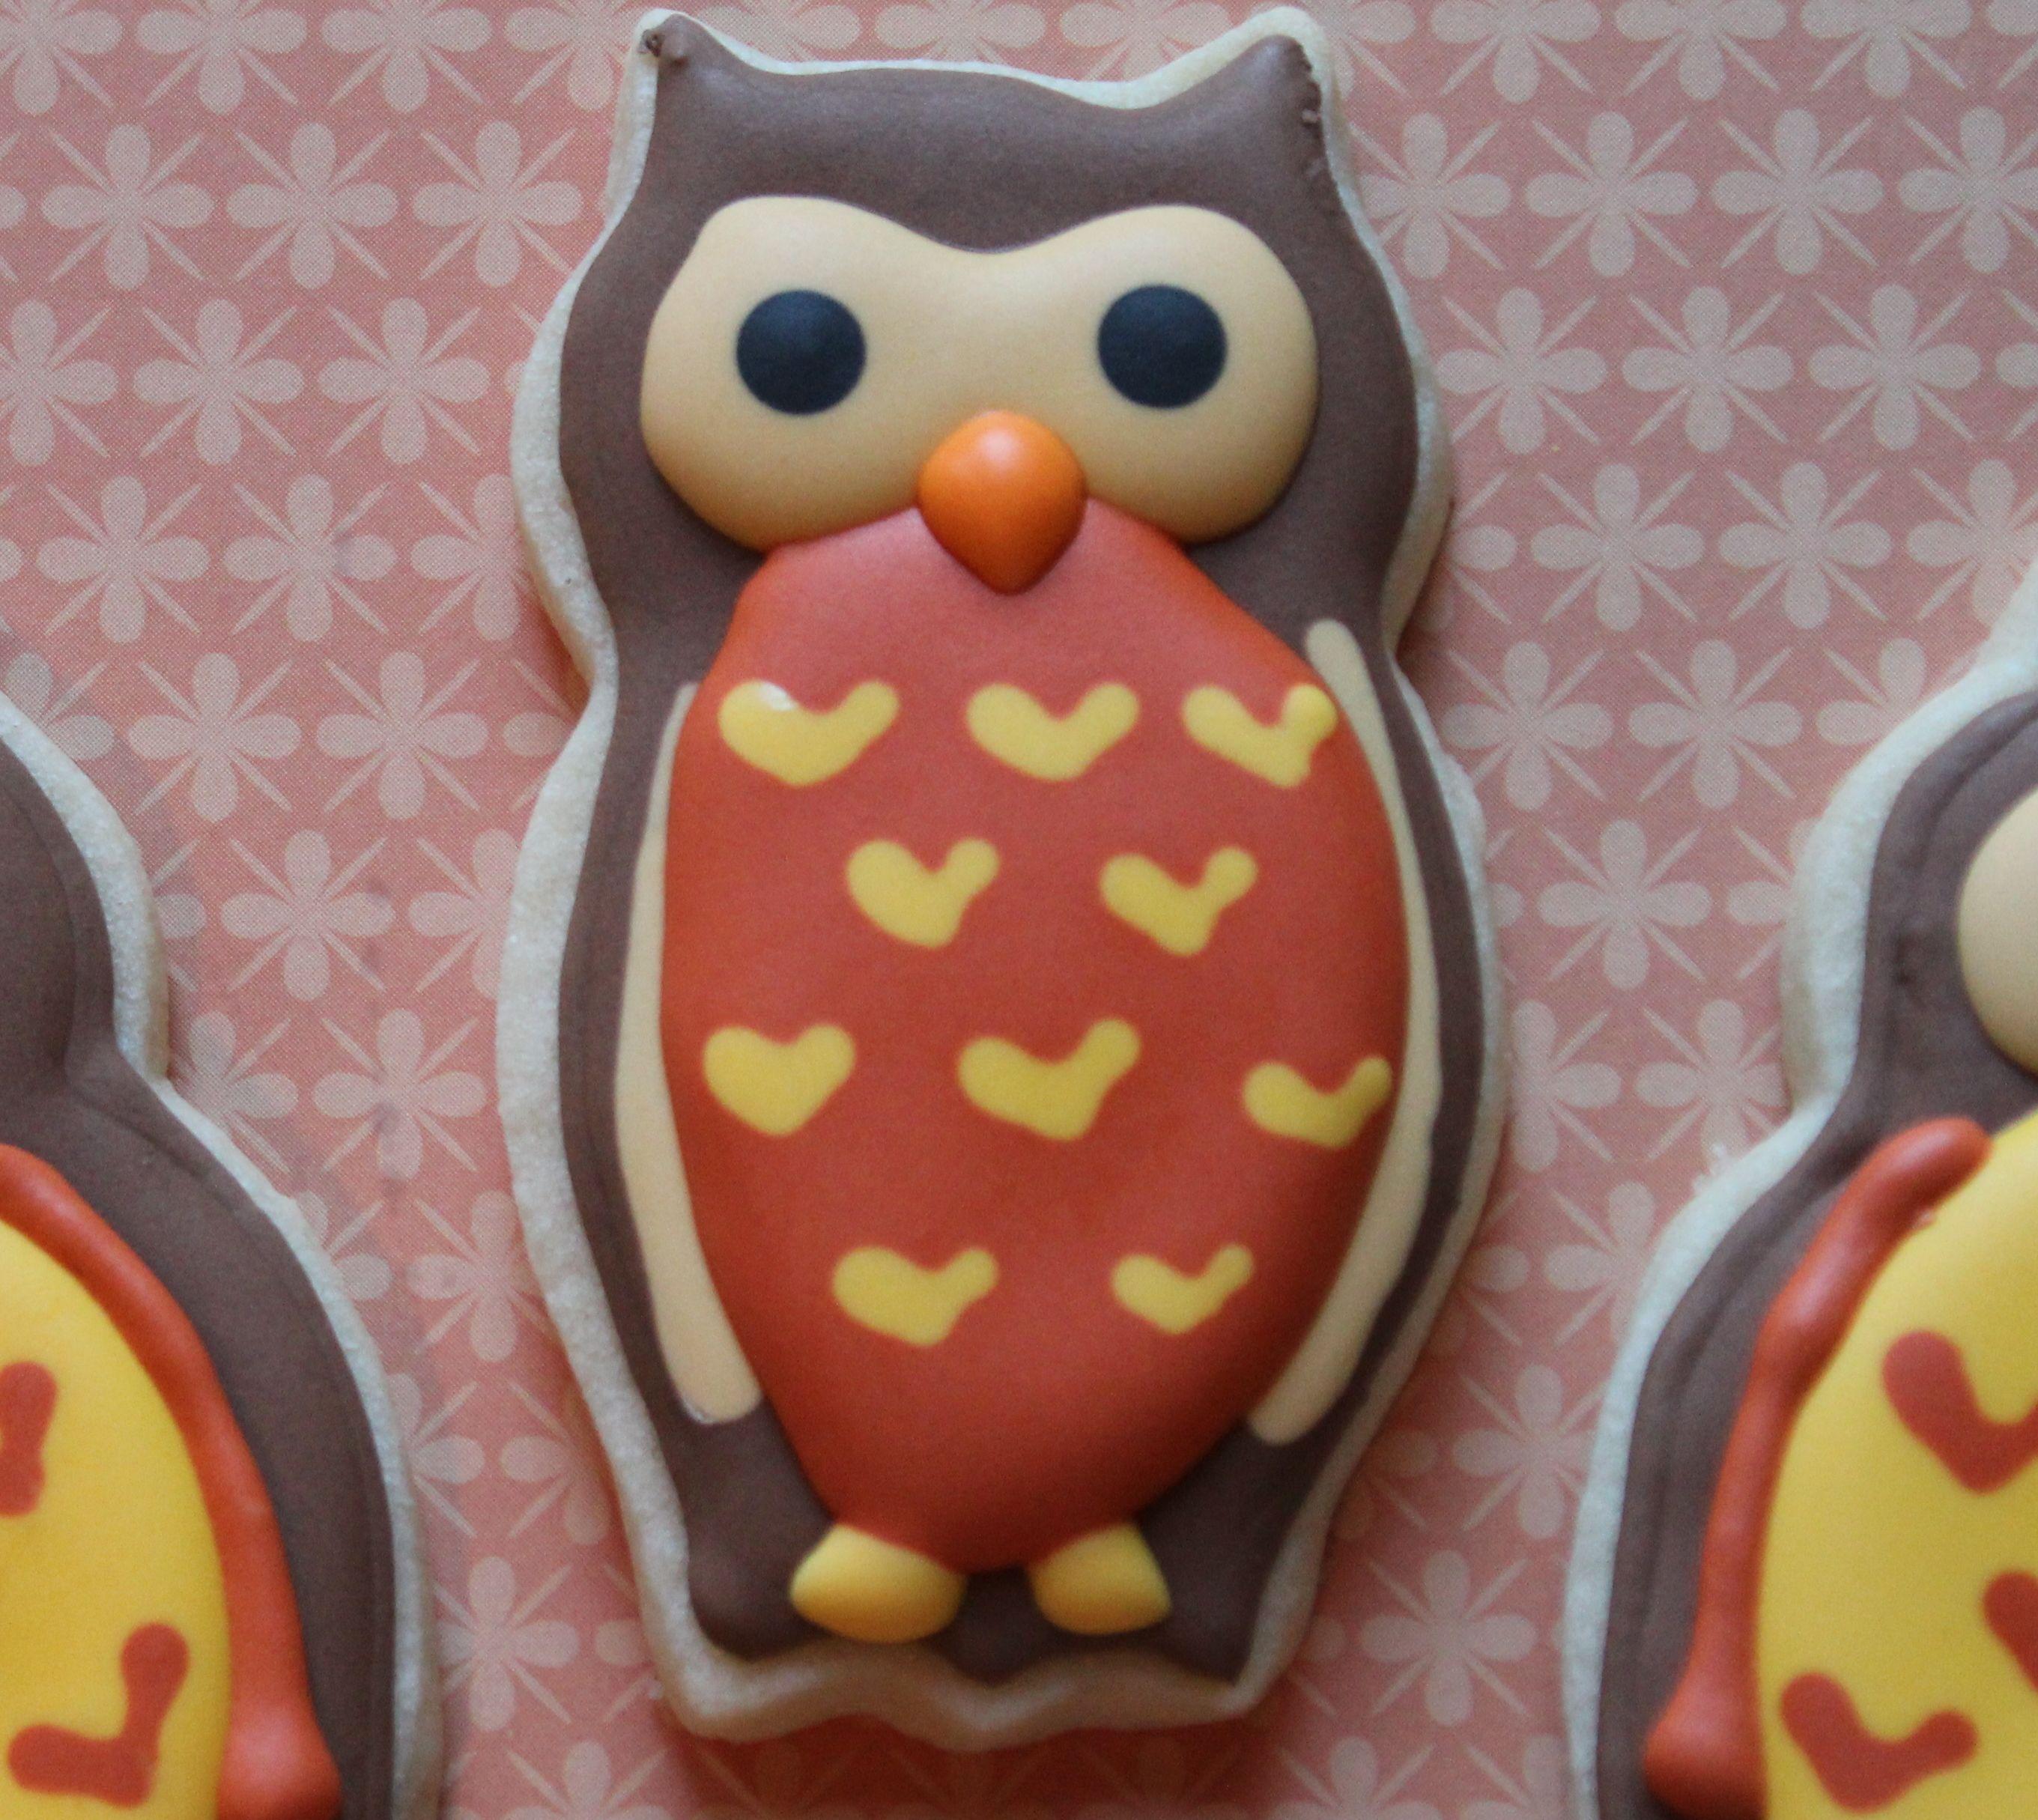 Pin By Amy Im On Wedding Owl Sugar Cookies Sugar Cookie Royal Icing Cookie Tutorials